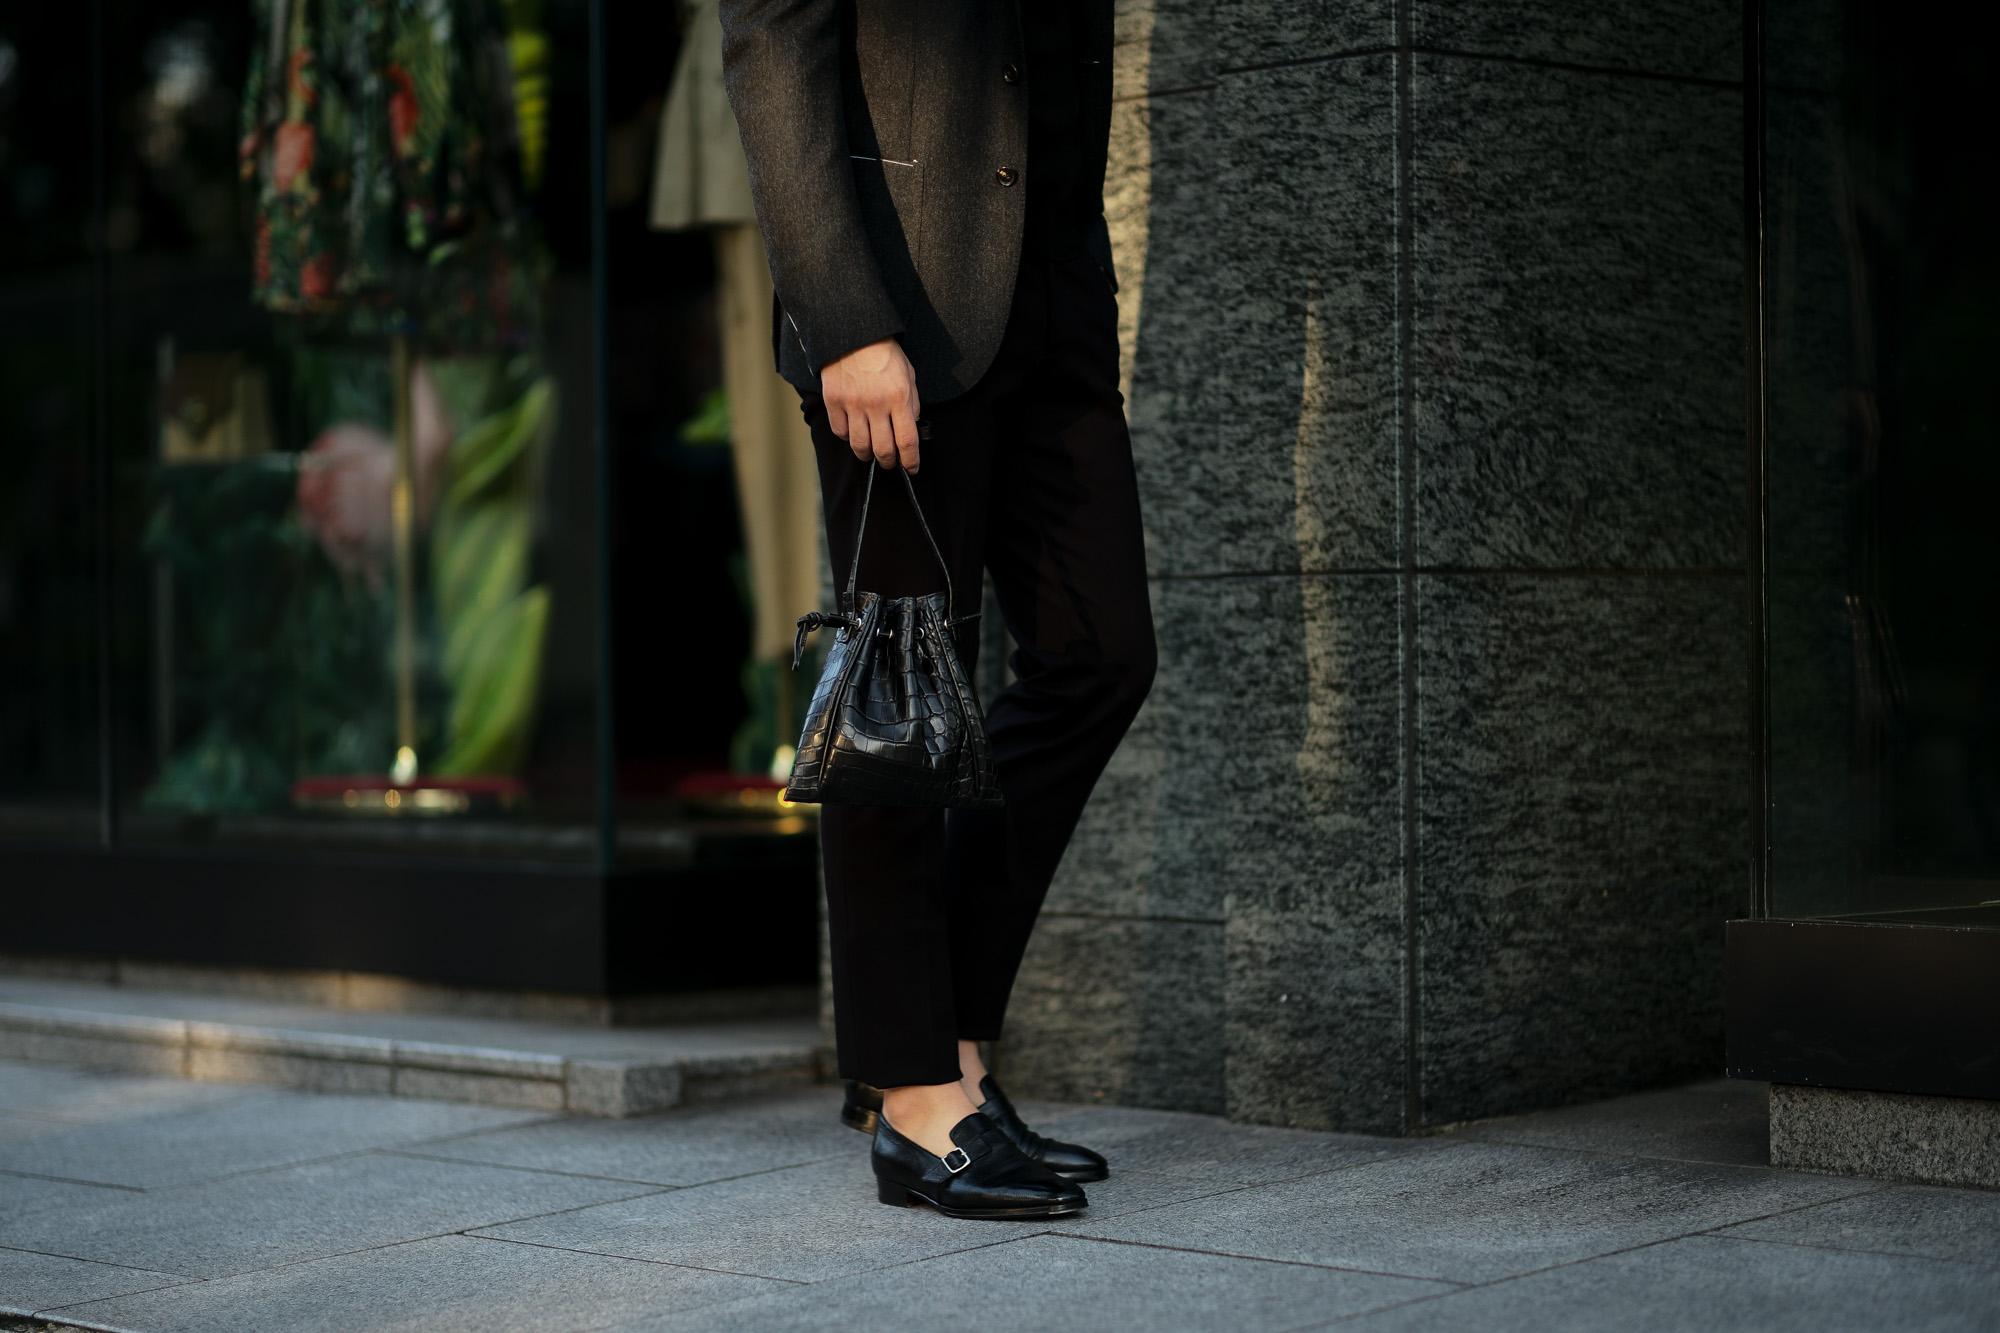 cuervo bopoha(クエルボ ヴァローナ) FLOYD(フロイド) Crocodile Leather(クロコダイルレザー) レザードローストリングバック 巾着 BLACK (ブラック) Made in Japan(日本製) 2020【Special Model】 愛知 名古屋 altoediritto アルトエデリット